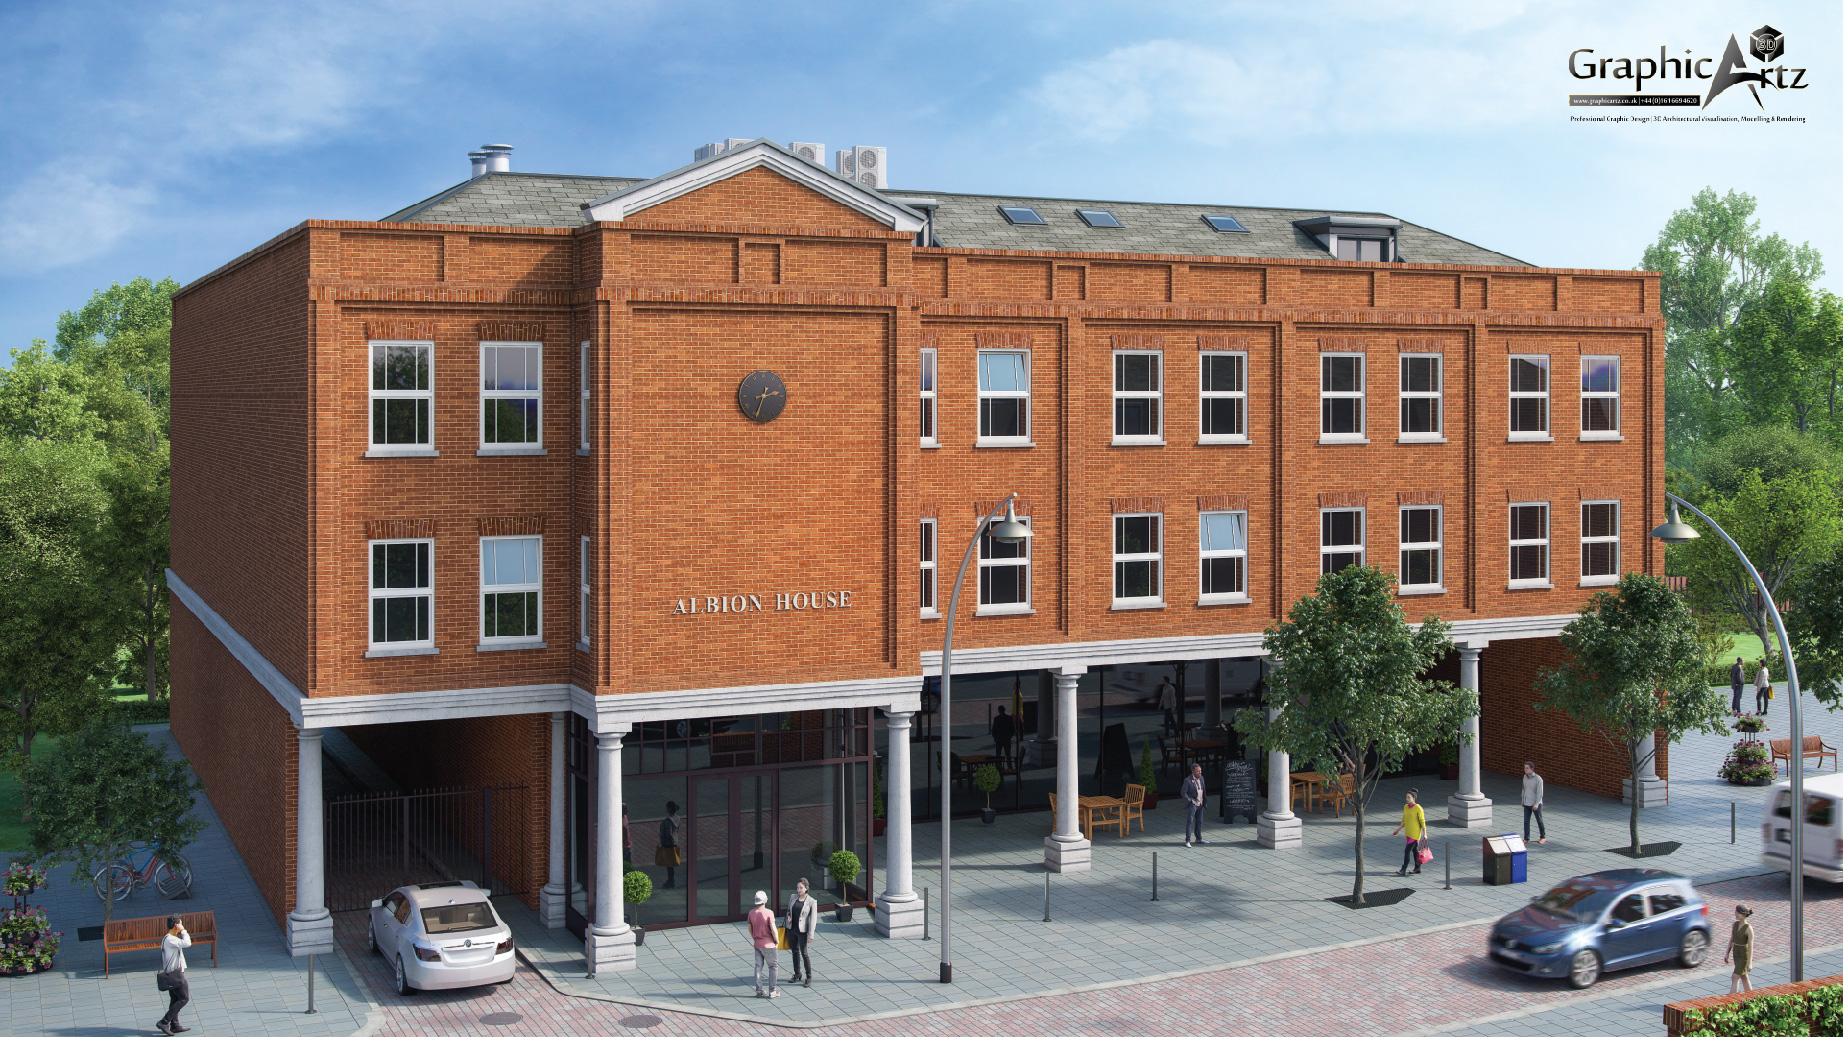 Albion House exterior CGI